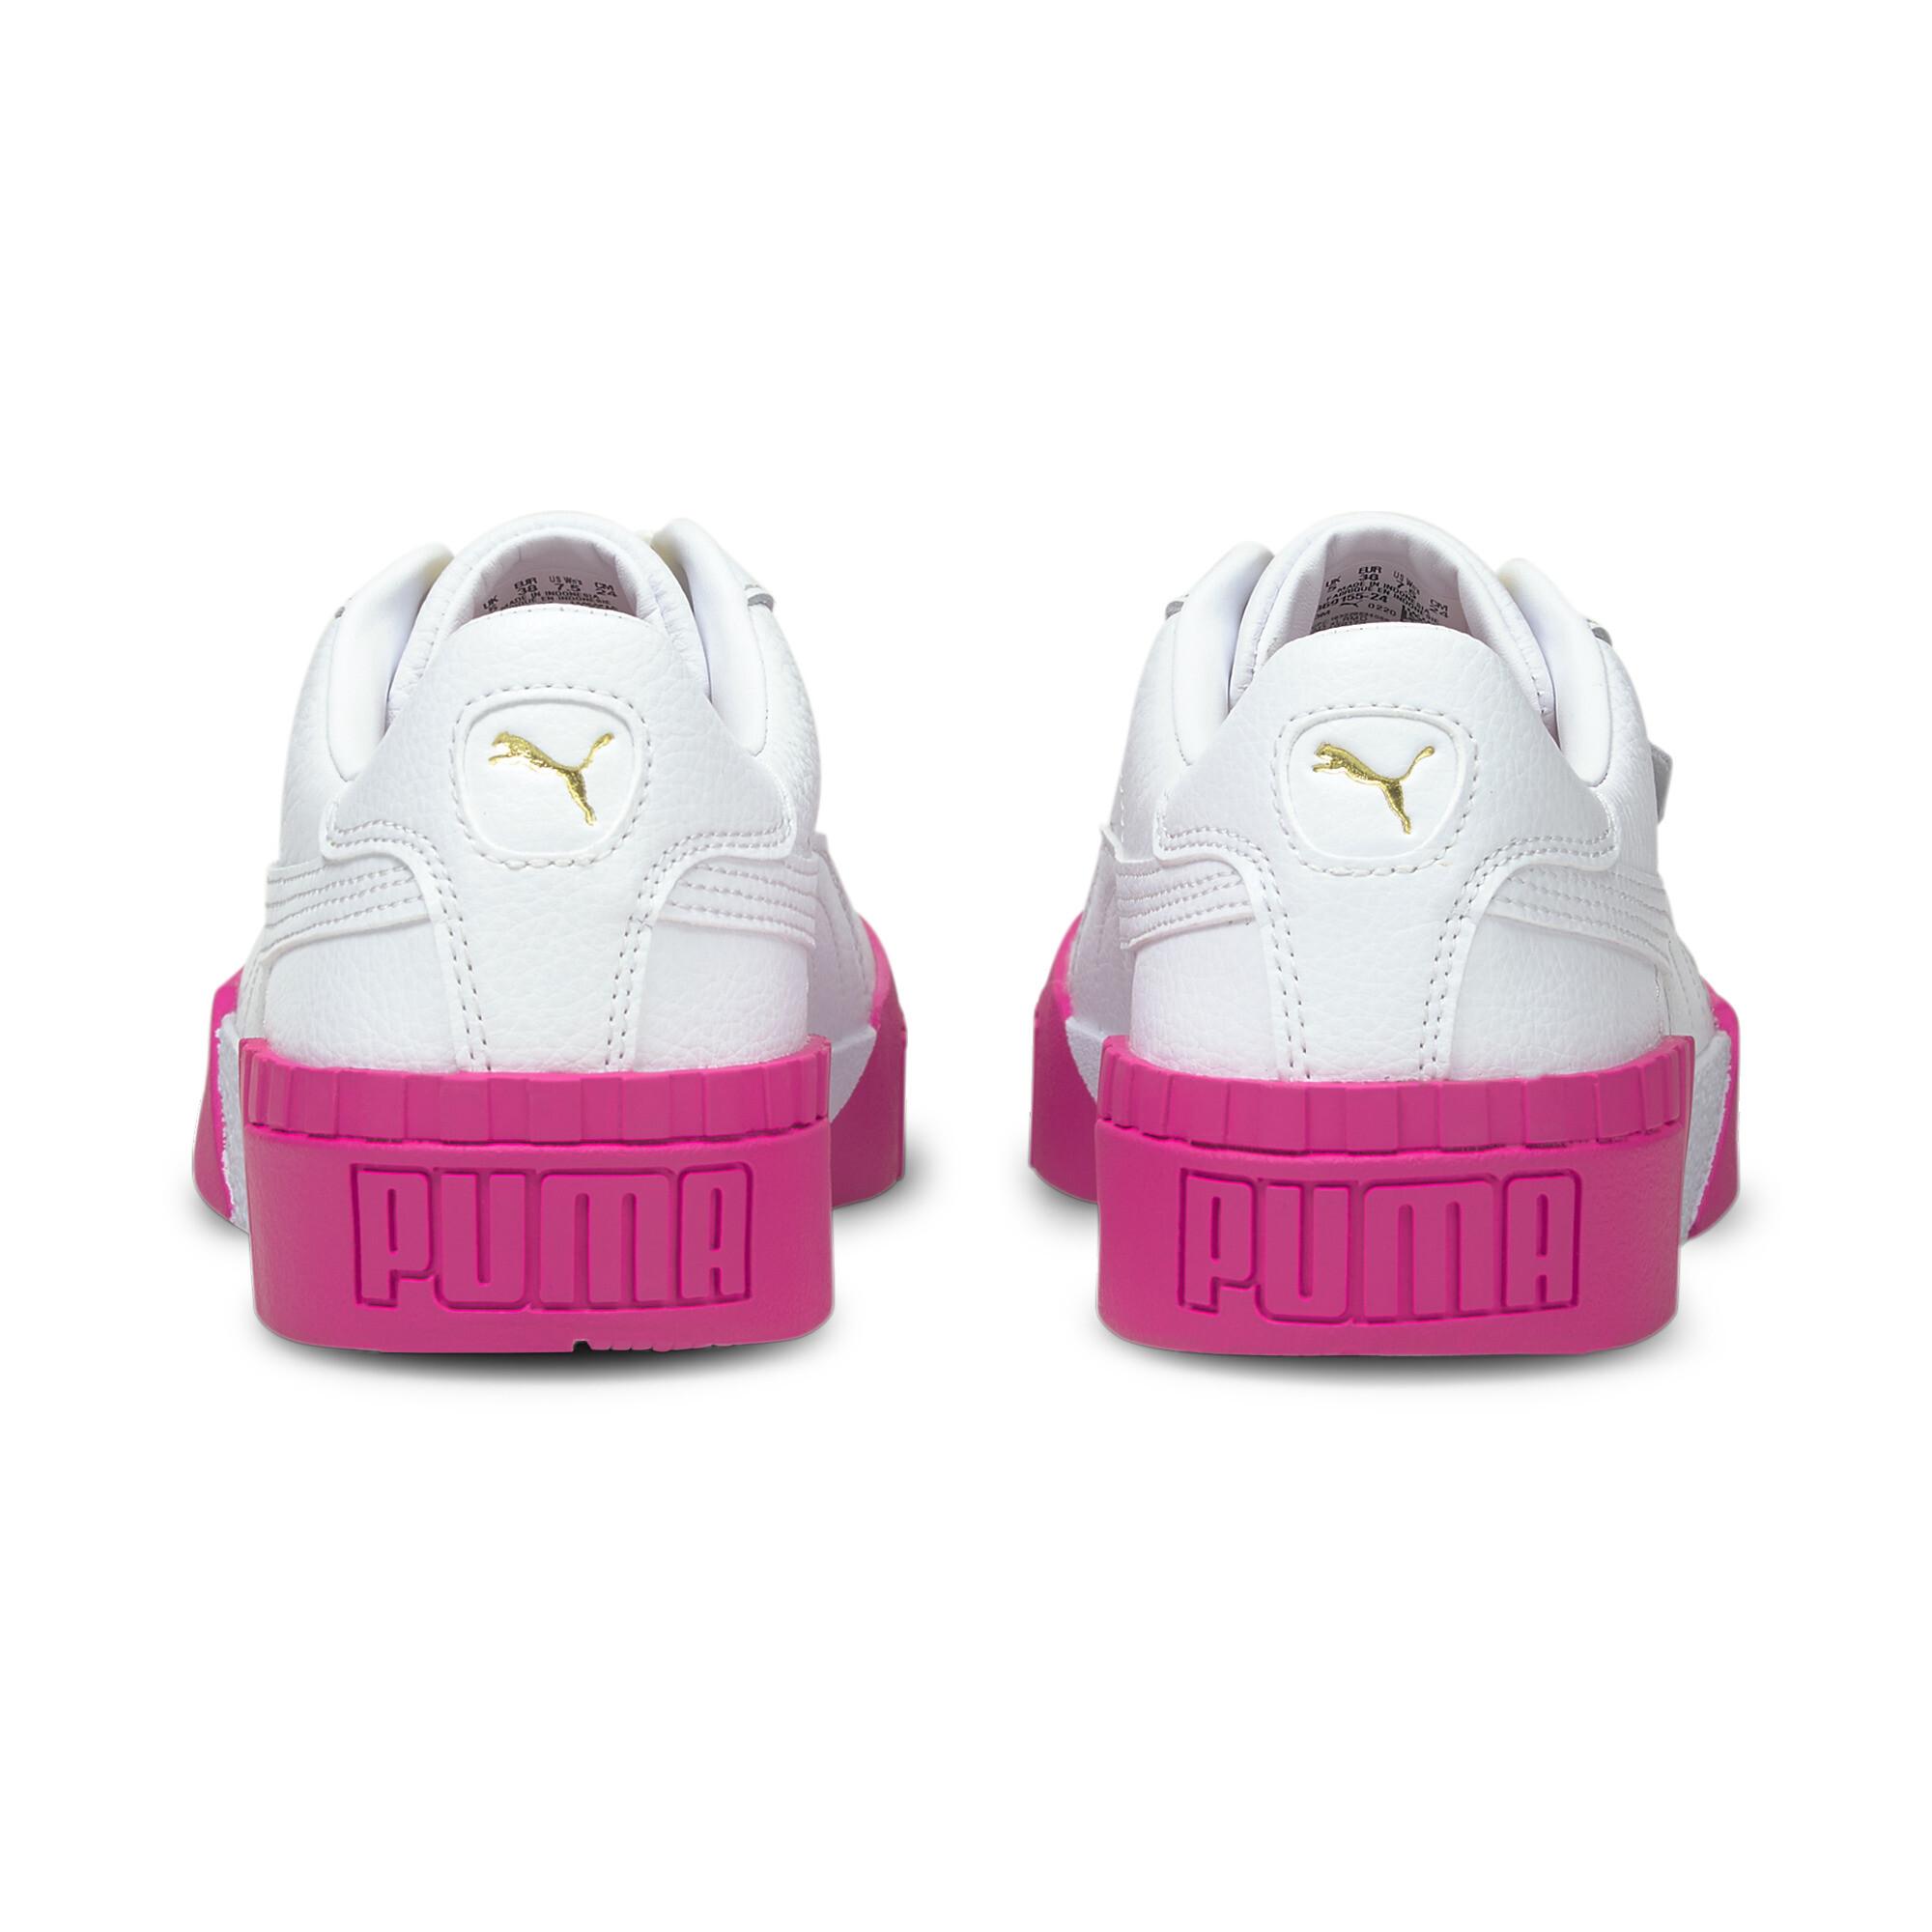 PUMA-Women-039-s-Cali-Sneakers thumbnail 3